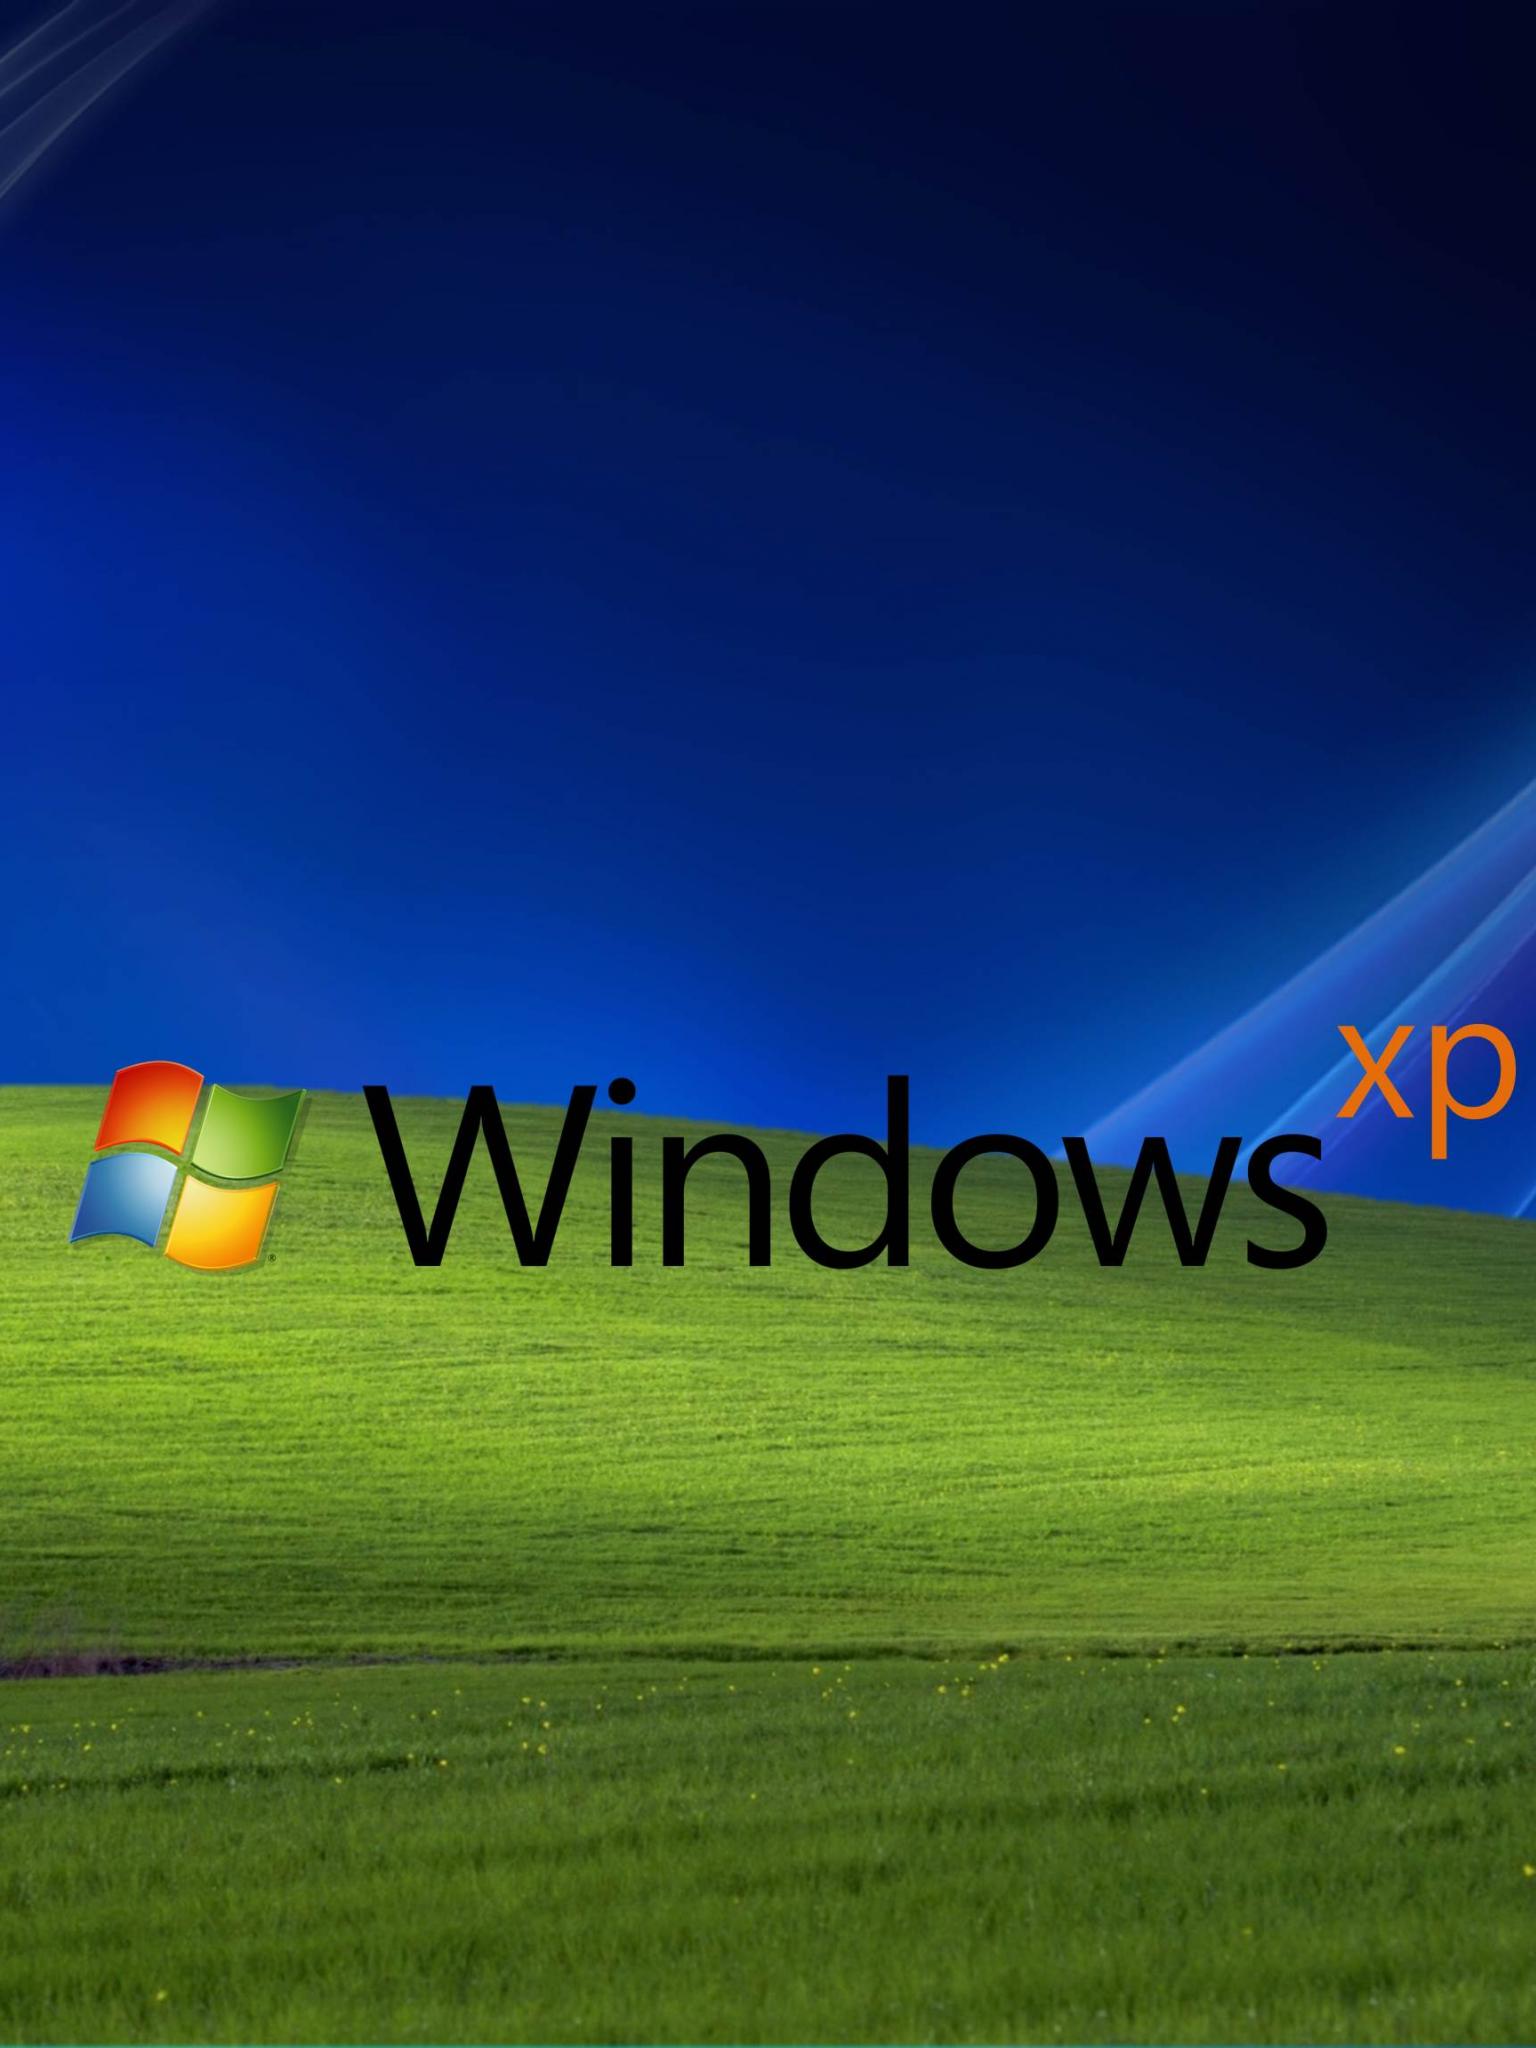 Free download HD Windows XP Windows HS Wallpaper [3070x2302] for